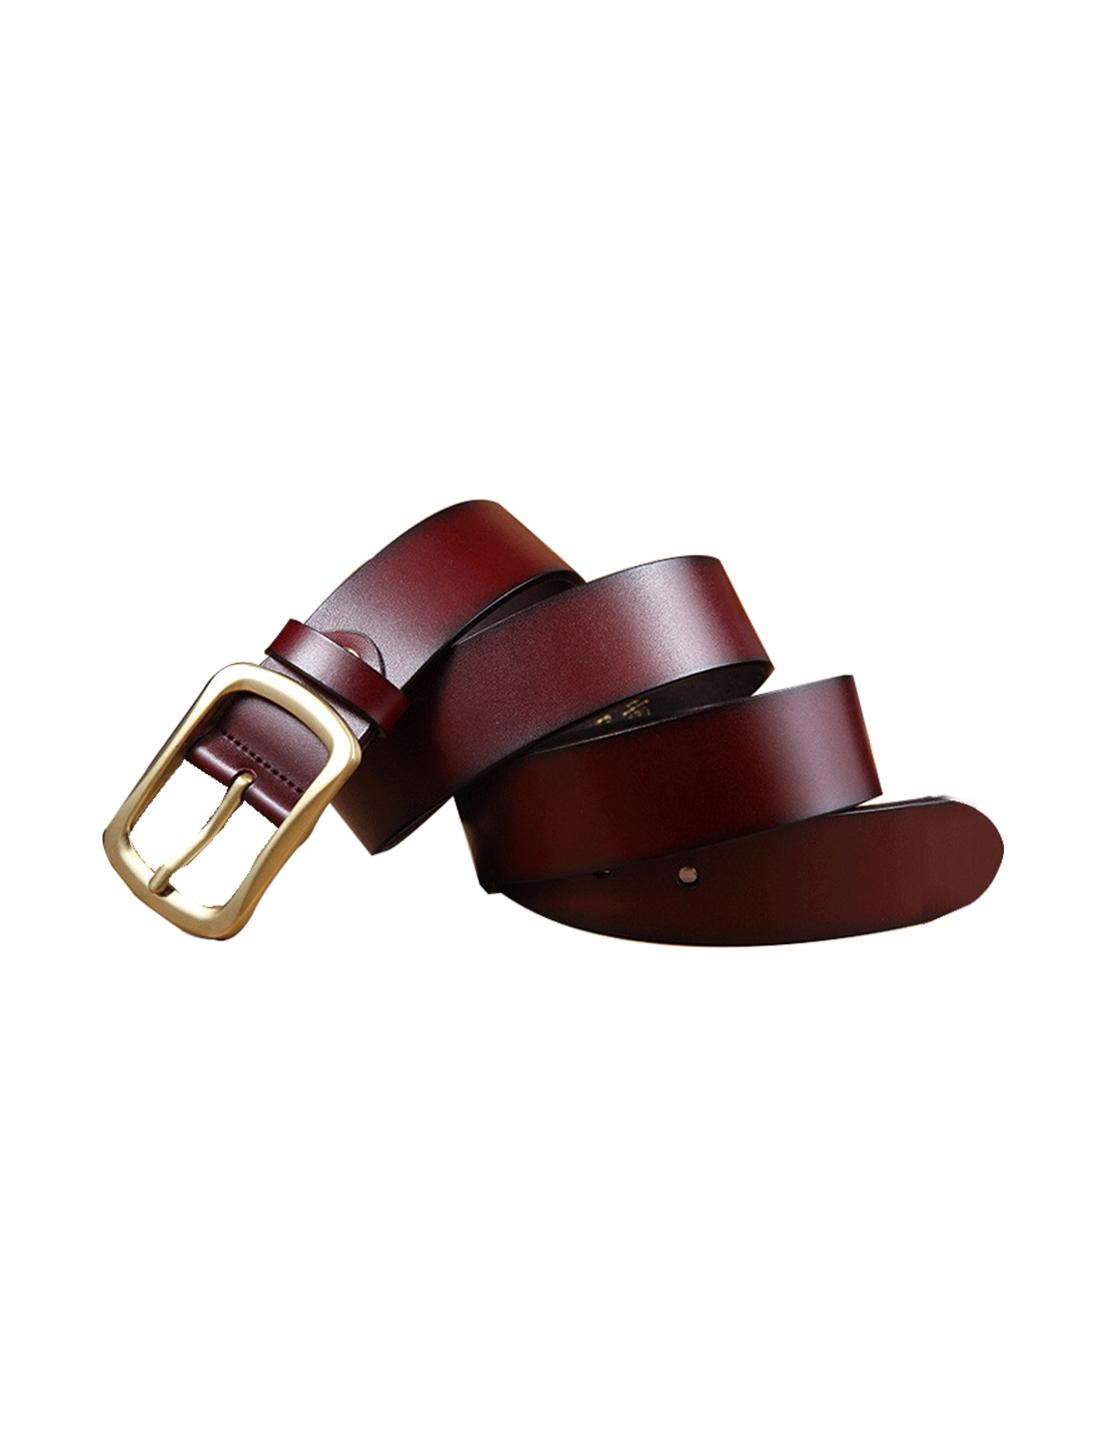 Mens Vintage Solid Pin Buckle Dress Leather Belt 38mm Width 1 1/2 Brown 110cm